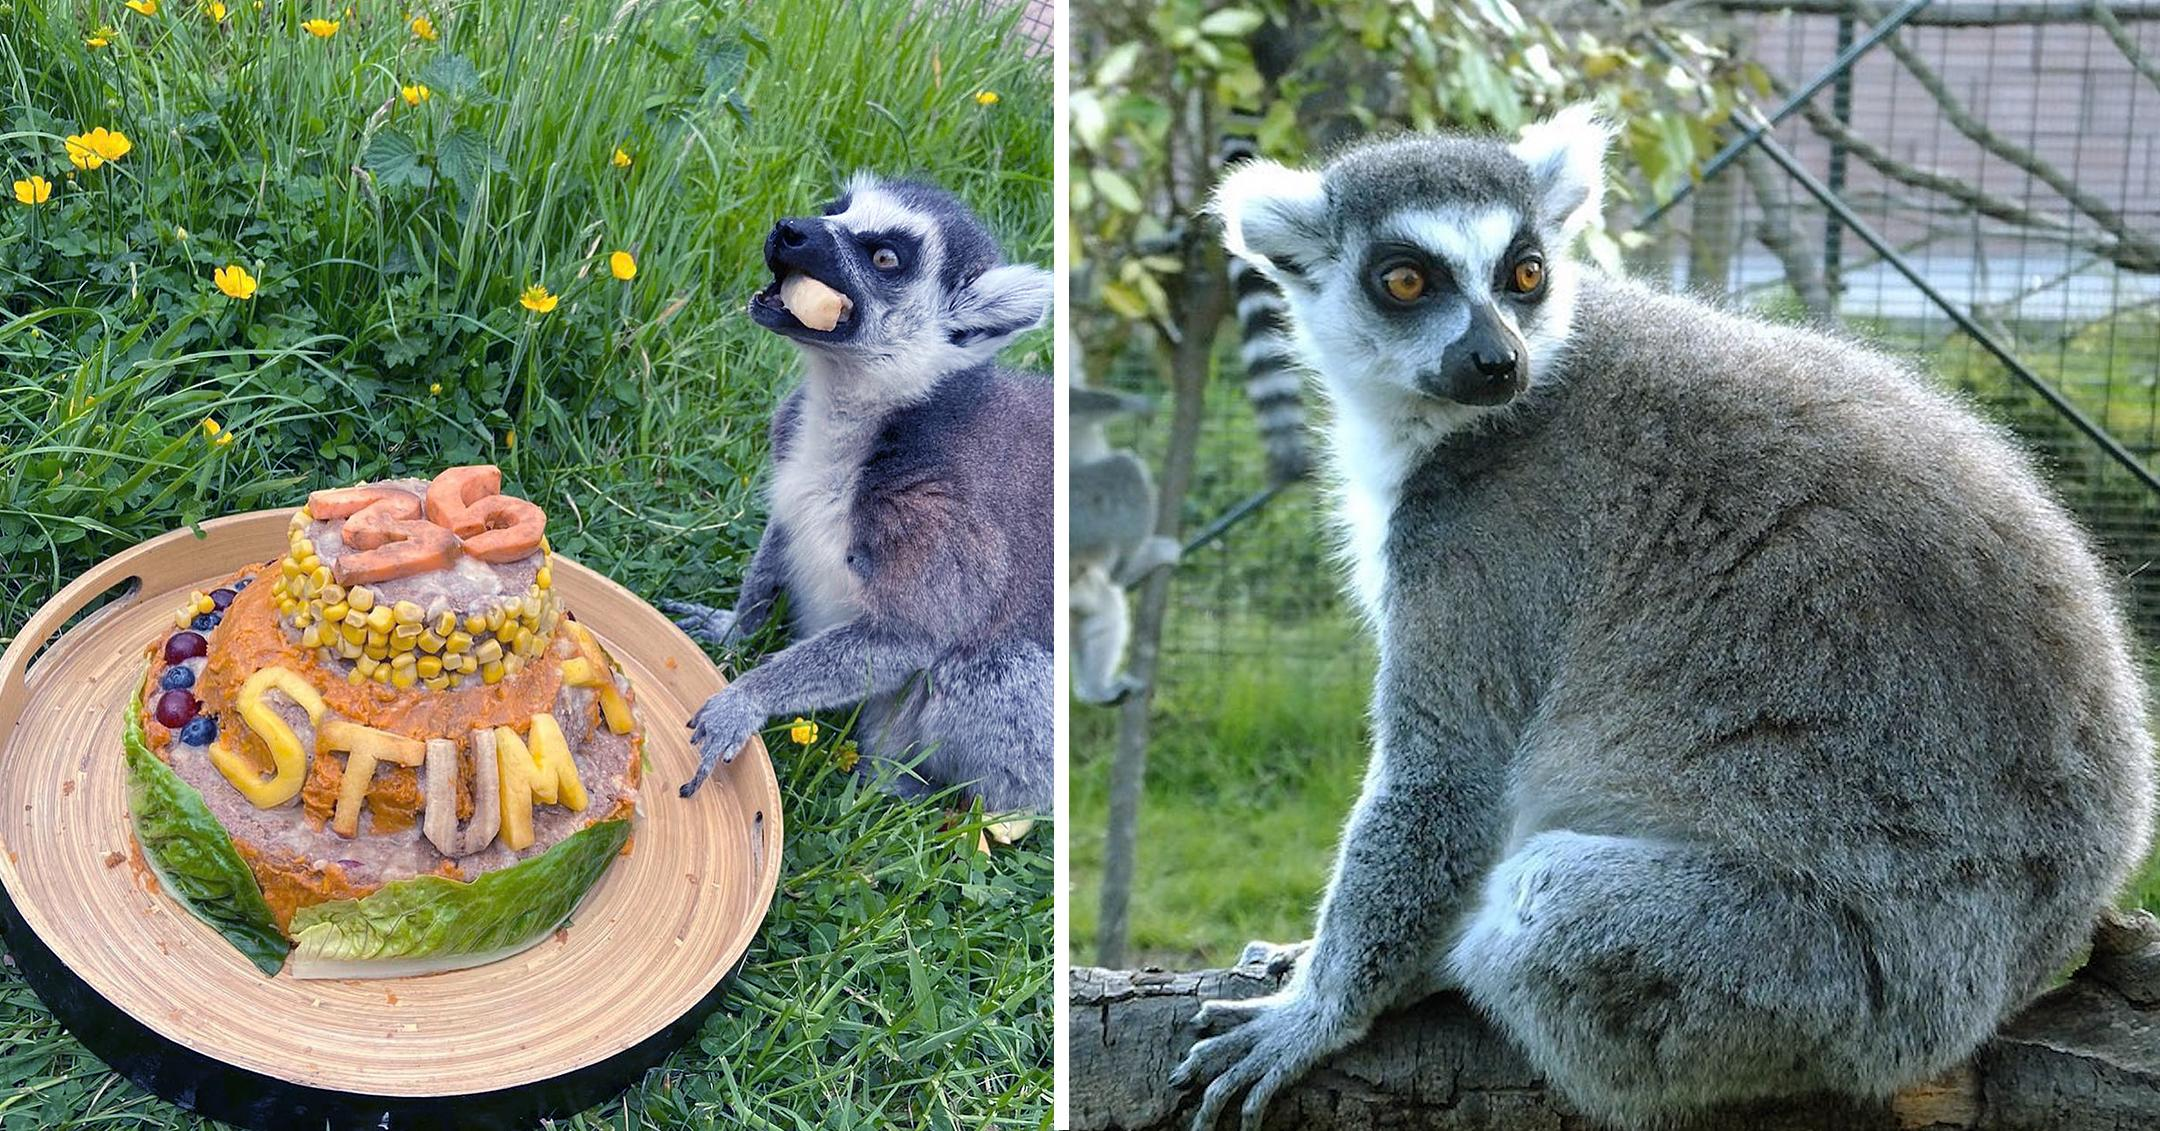 worlds oldest lemur turns